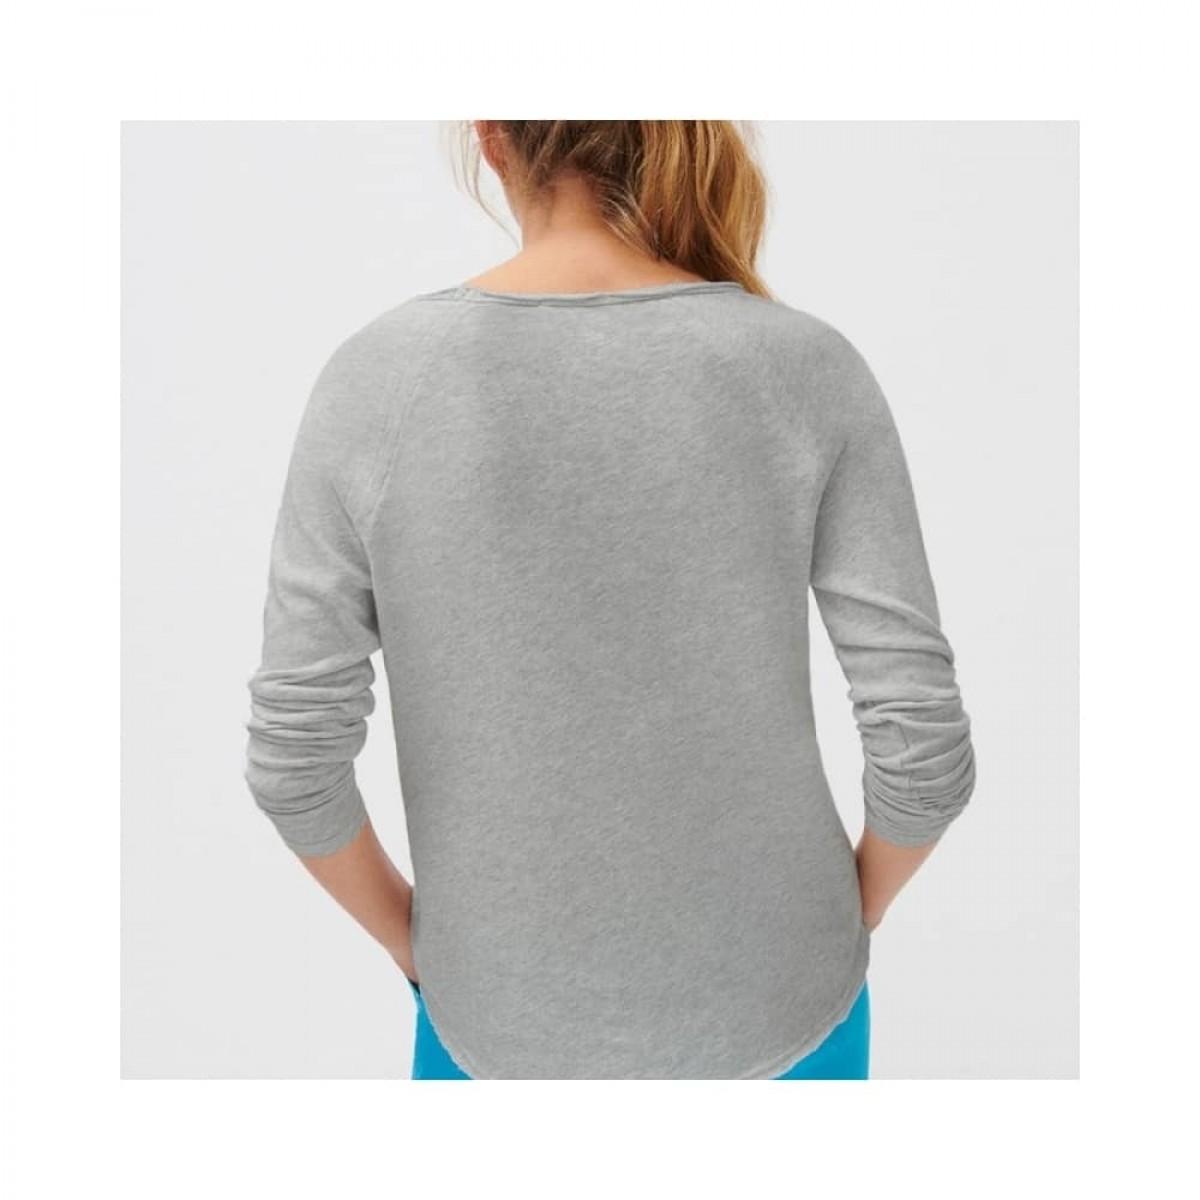 sonoma bluse - heather grey - model ryggen